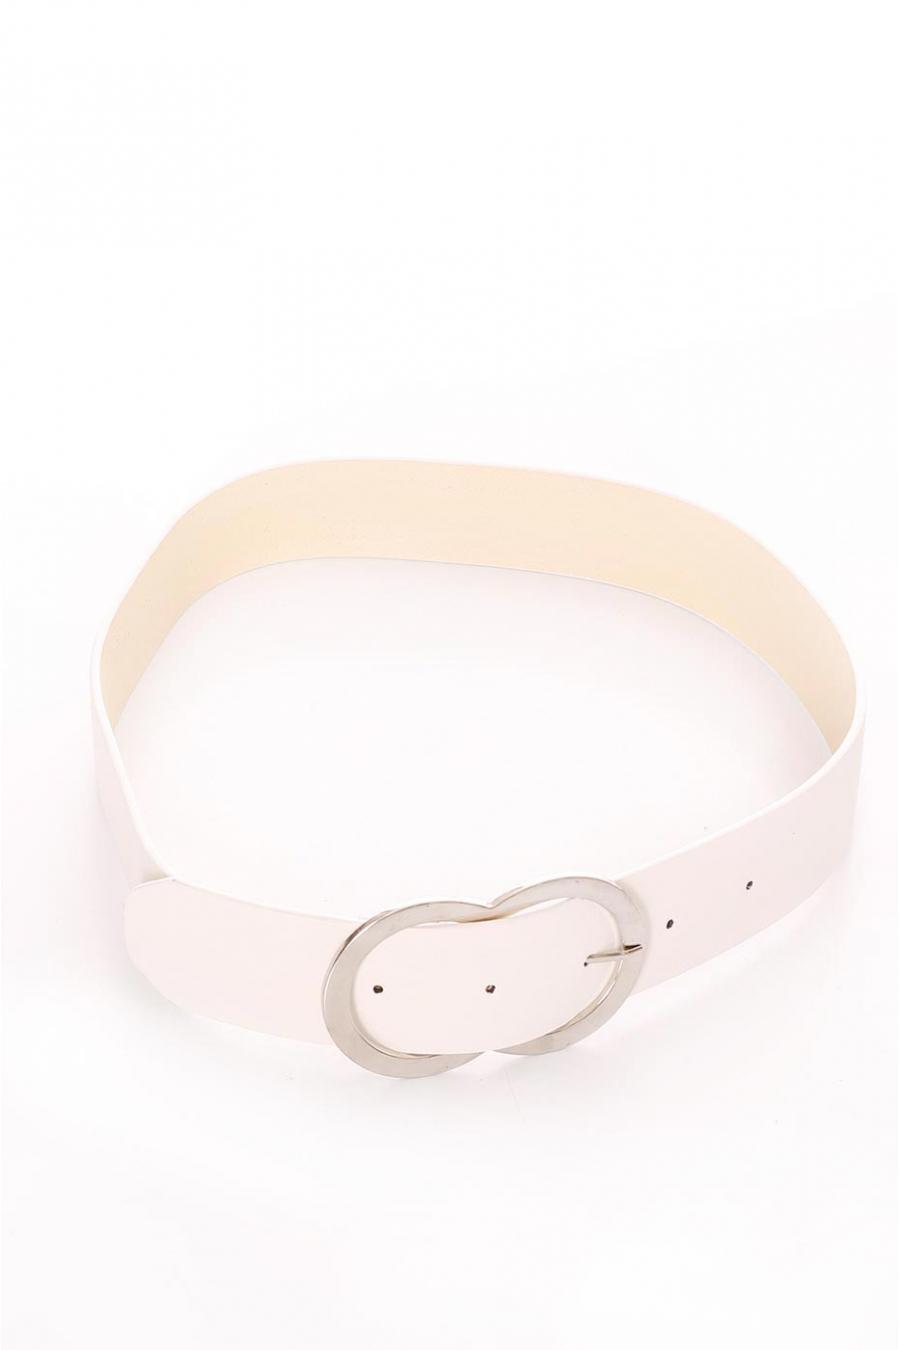 Basic white belt with silver buckle. BG-PO43